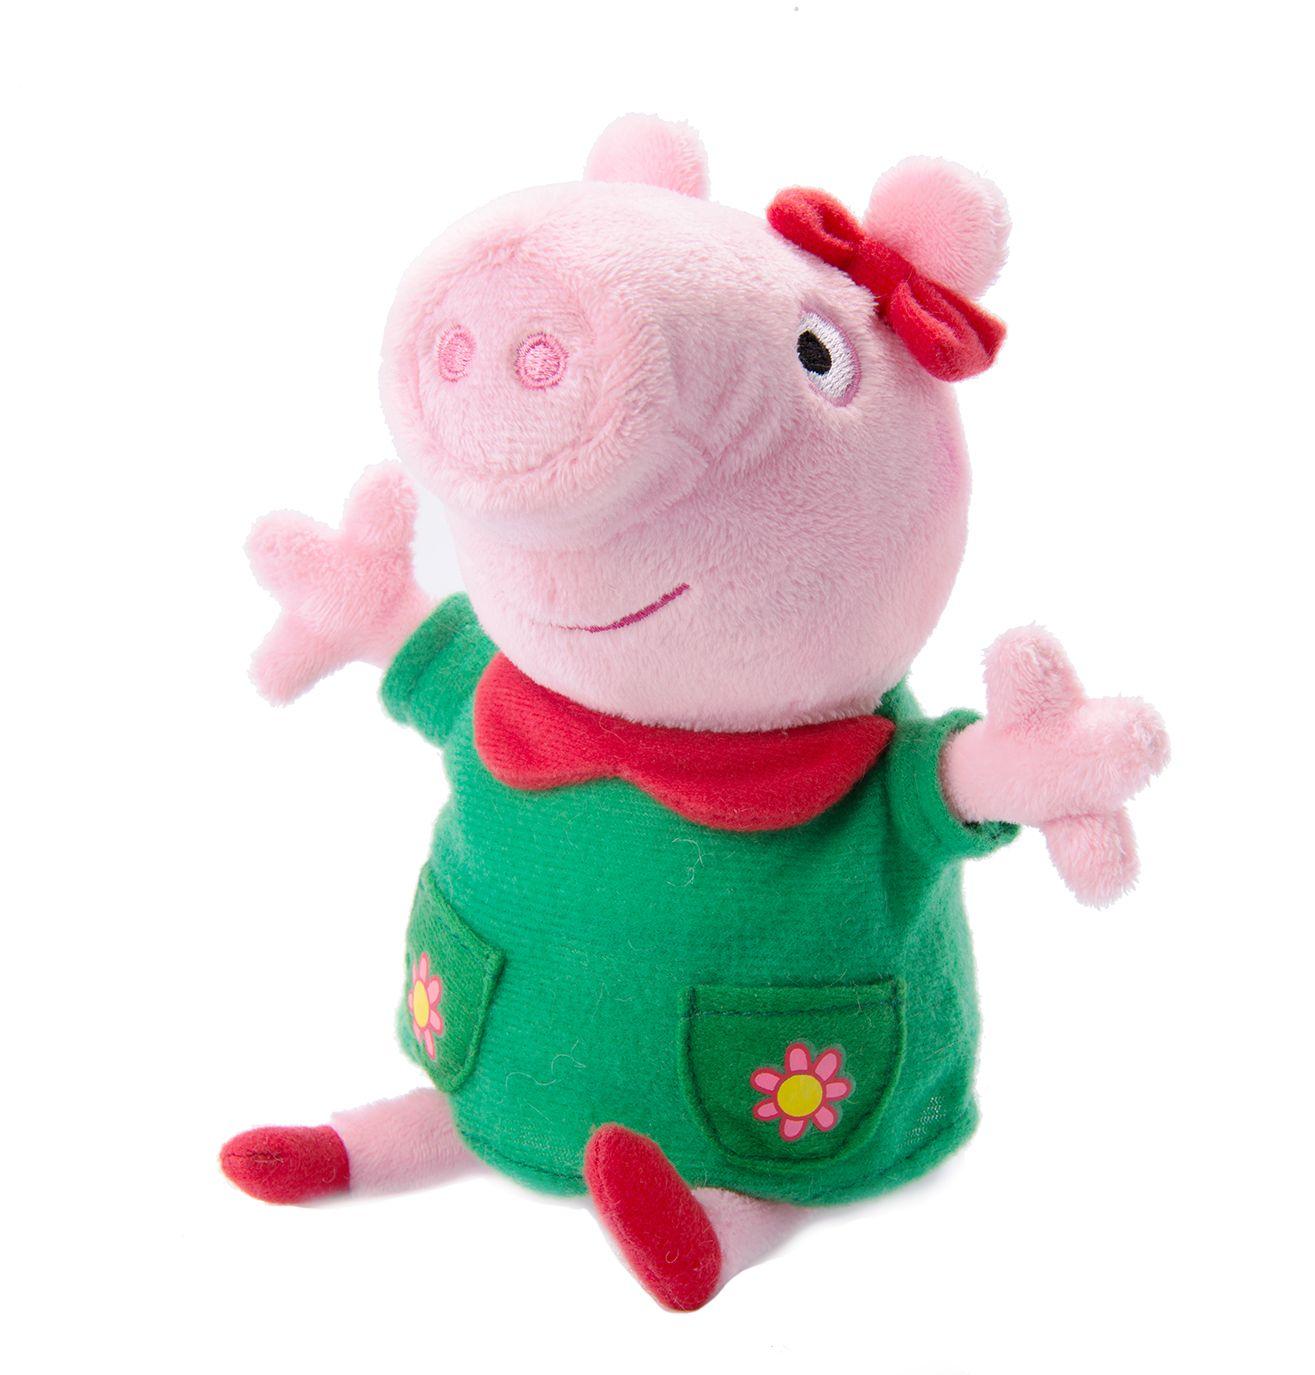 Мягкая игрушка Peppa Pig: Пеппа модница со звуком (20 см) мягкие игрушки peppa pig мягкая игрушка пеппа модница 20 см